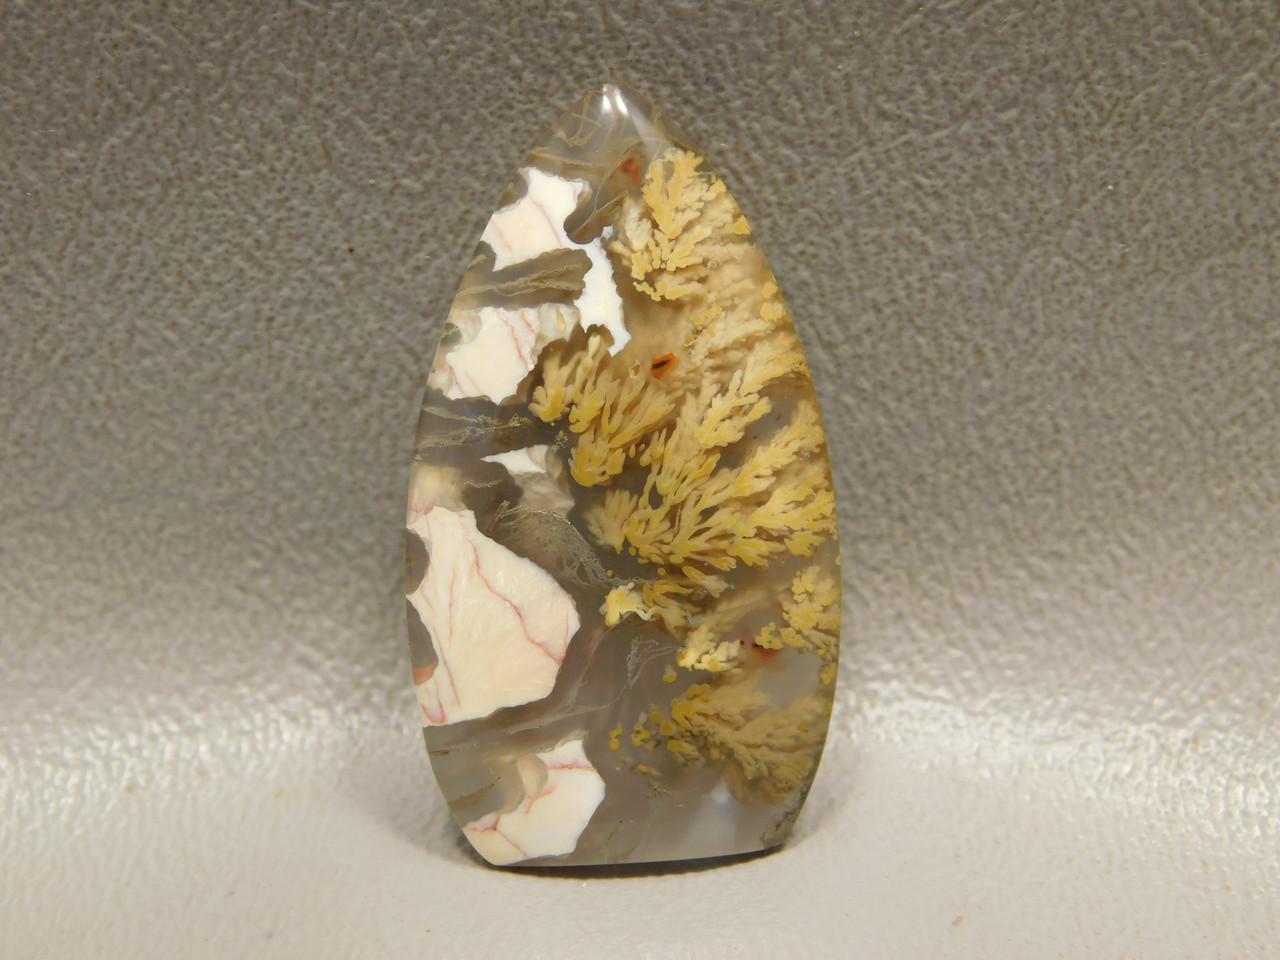 Translucent Priday Plume Agate Designer Stone Cabochon #15